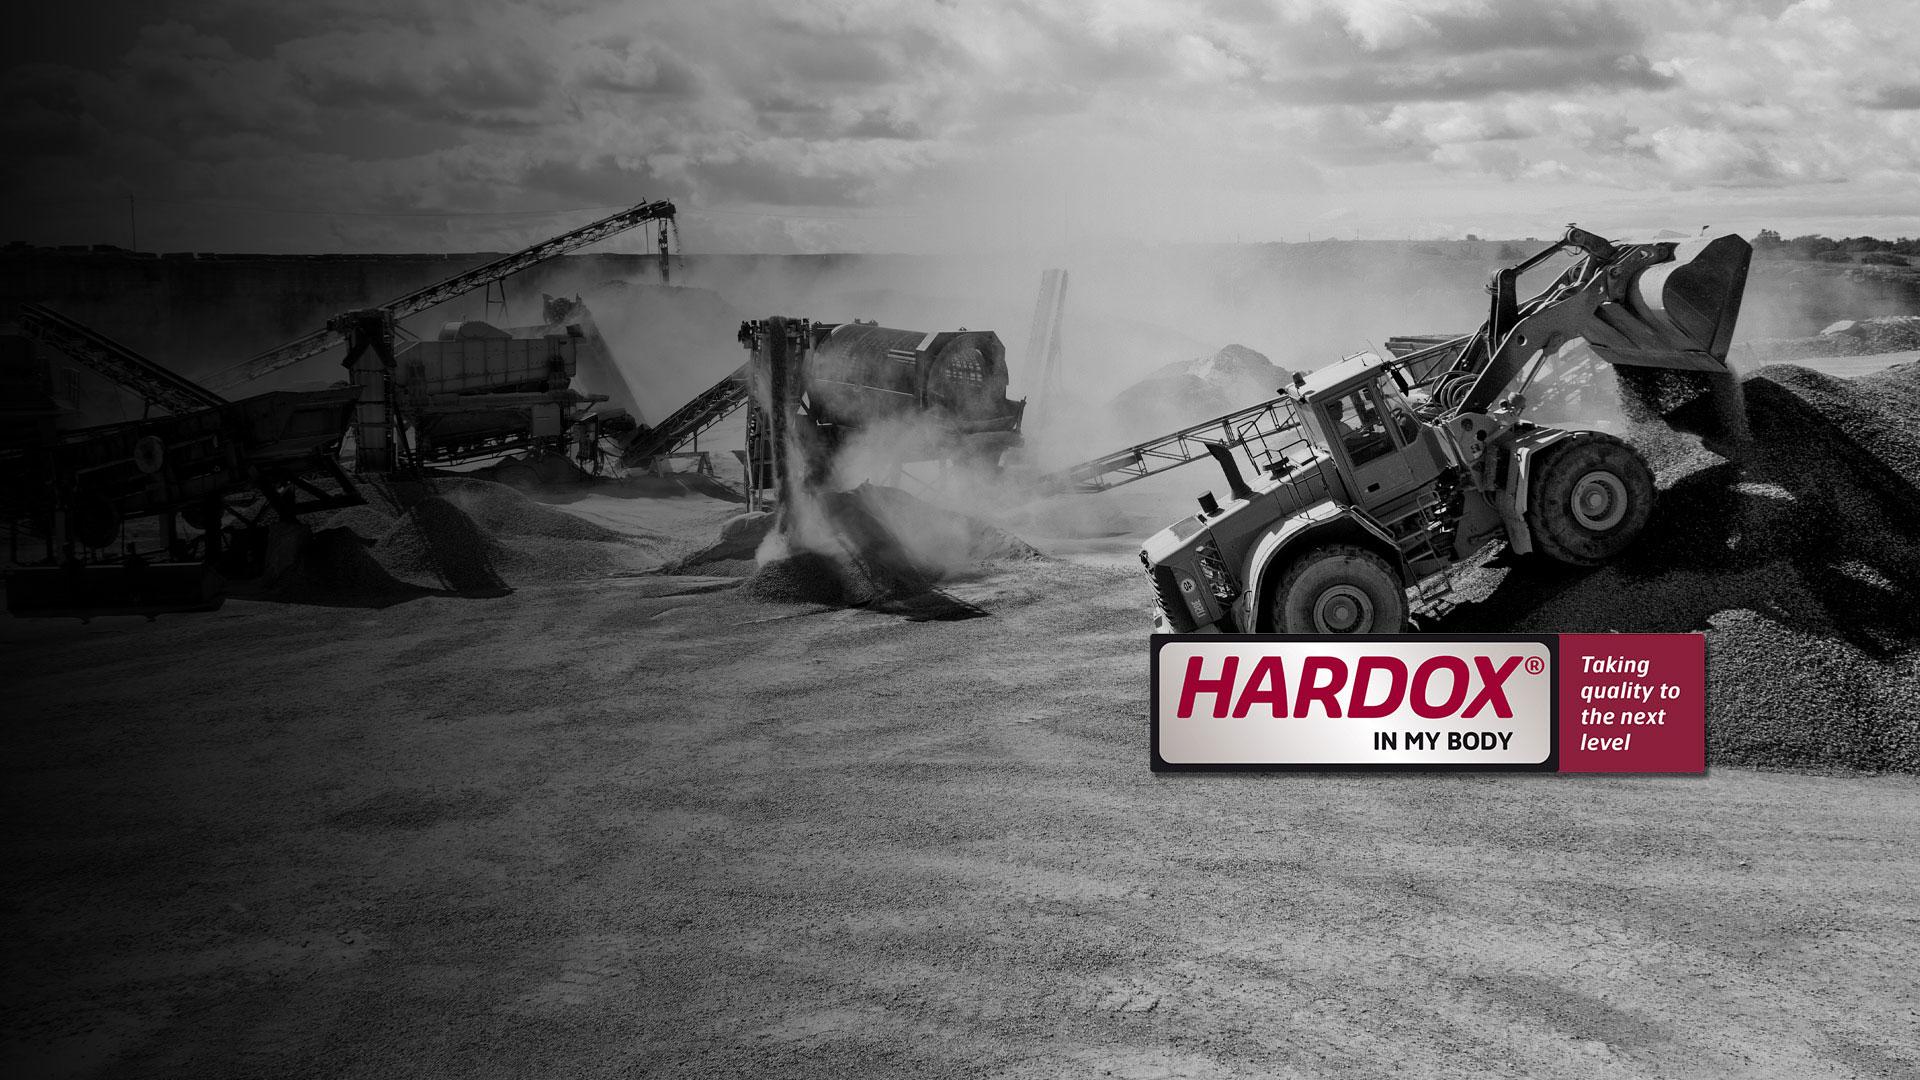 Vantaggi di Hardox In My Body